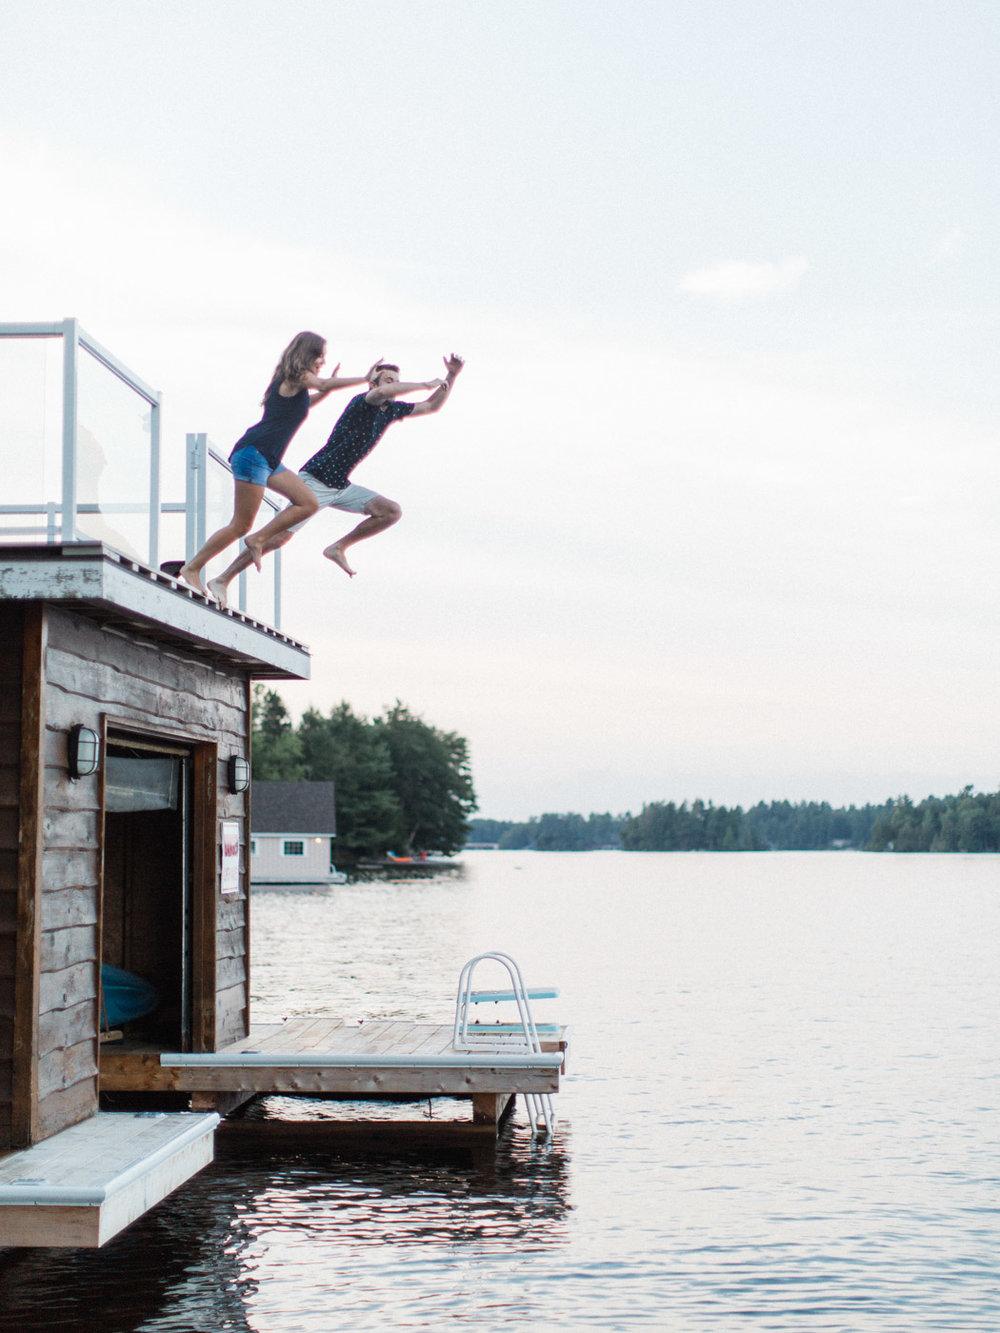 muskoka-wedding-photographer-adventurous-couples-engagement-session-lake-107.jpg